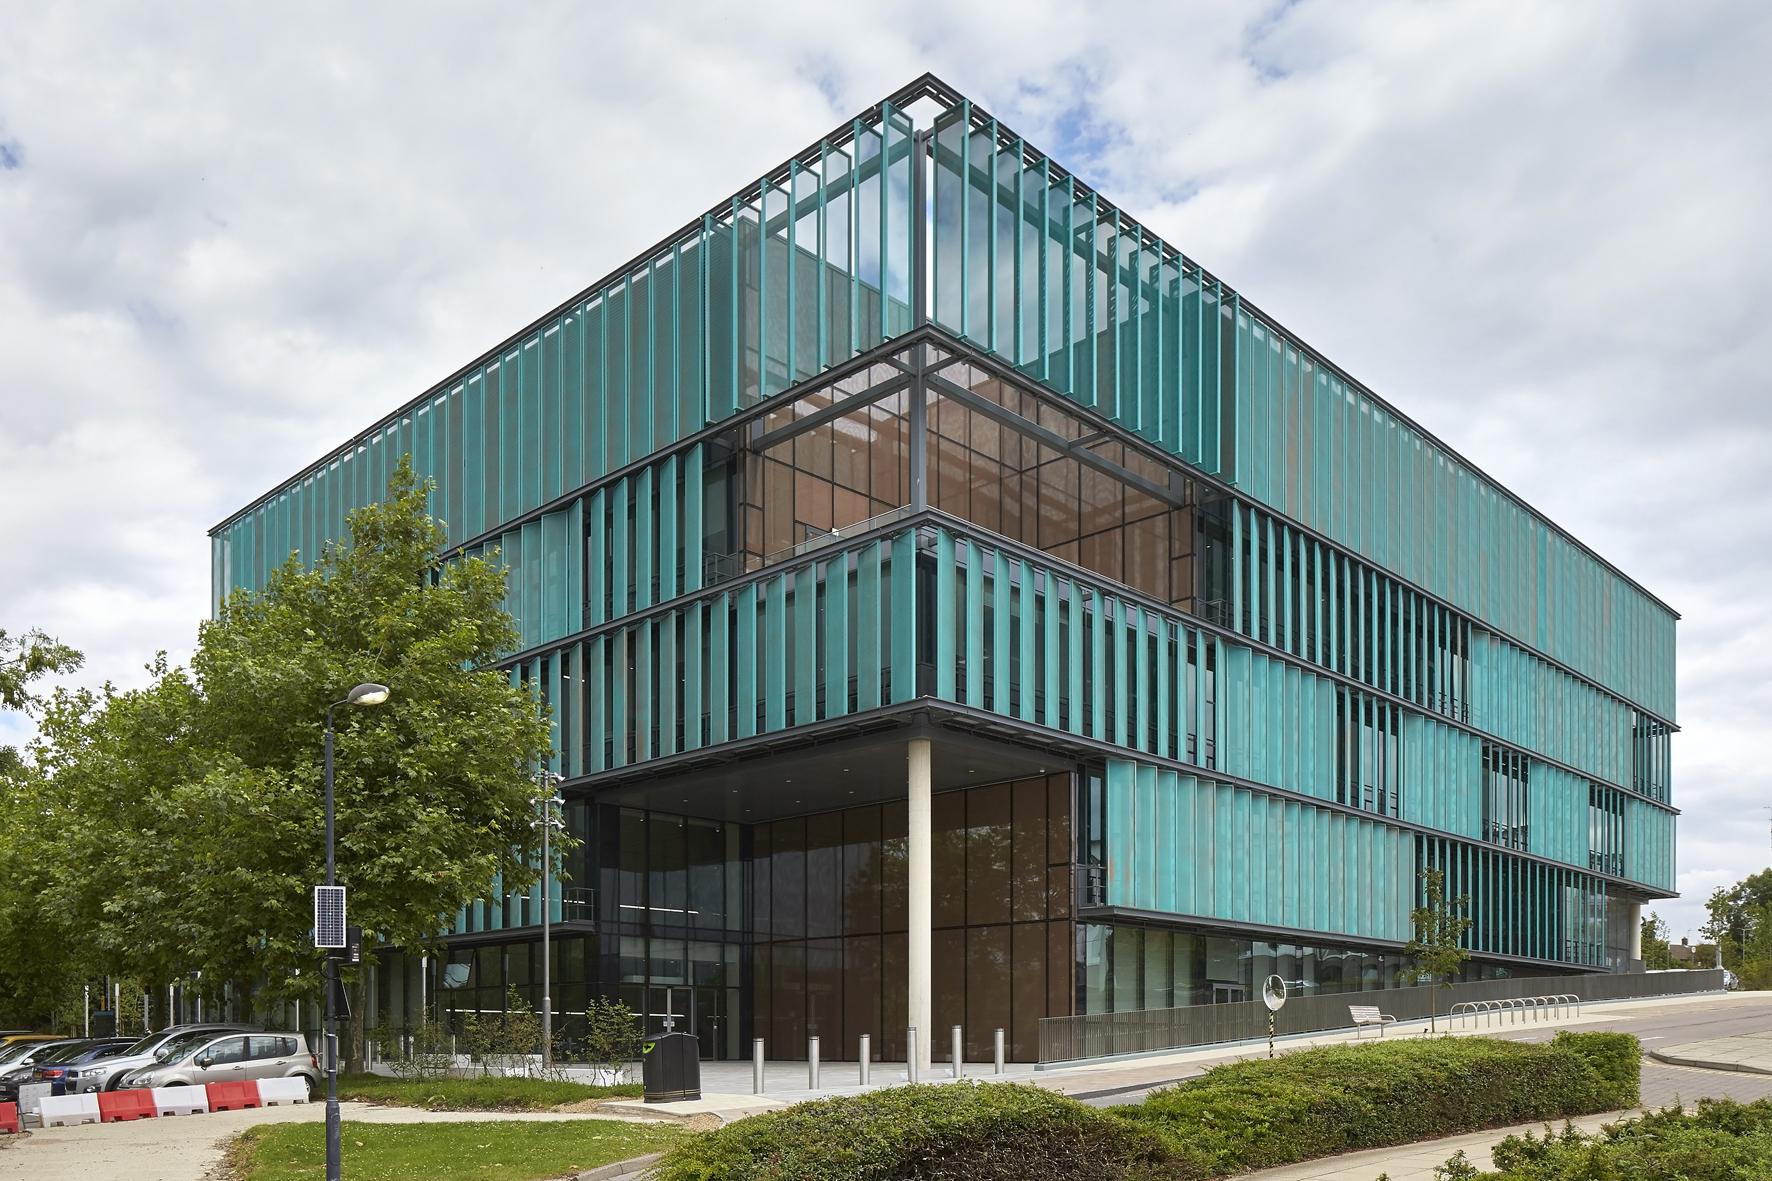 Glass facade design office building Angle Shot University Of Hertfordshire Hatfield Uk The Hathor Legacy Sefar Architecture Vision Creative Fabric Glass Design